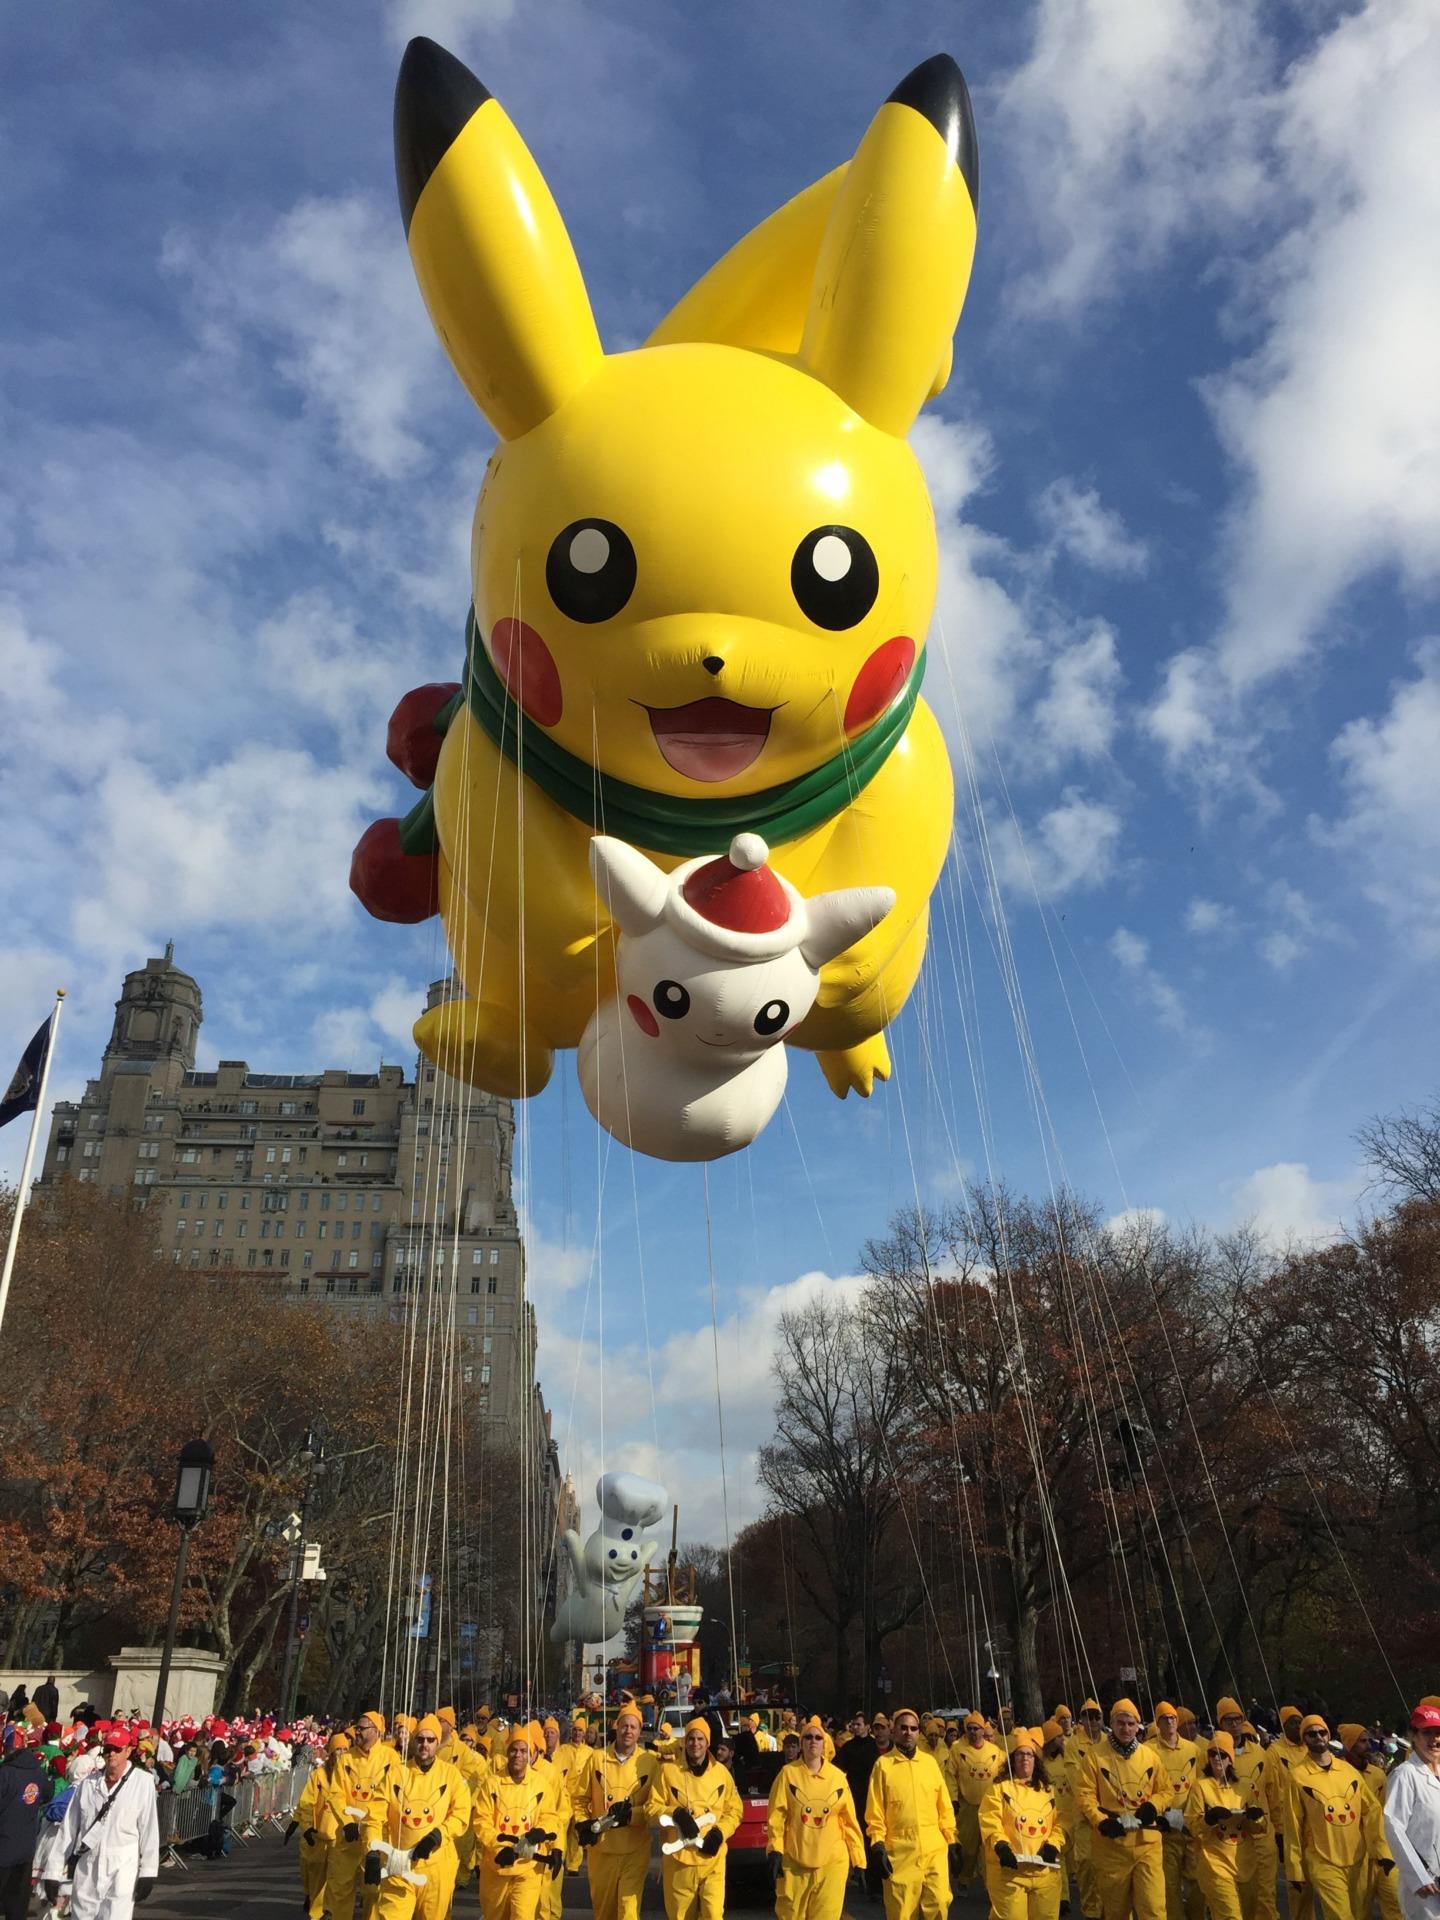 pikachu macy's parade pikachu pokemon balloon